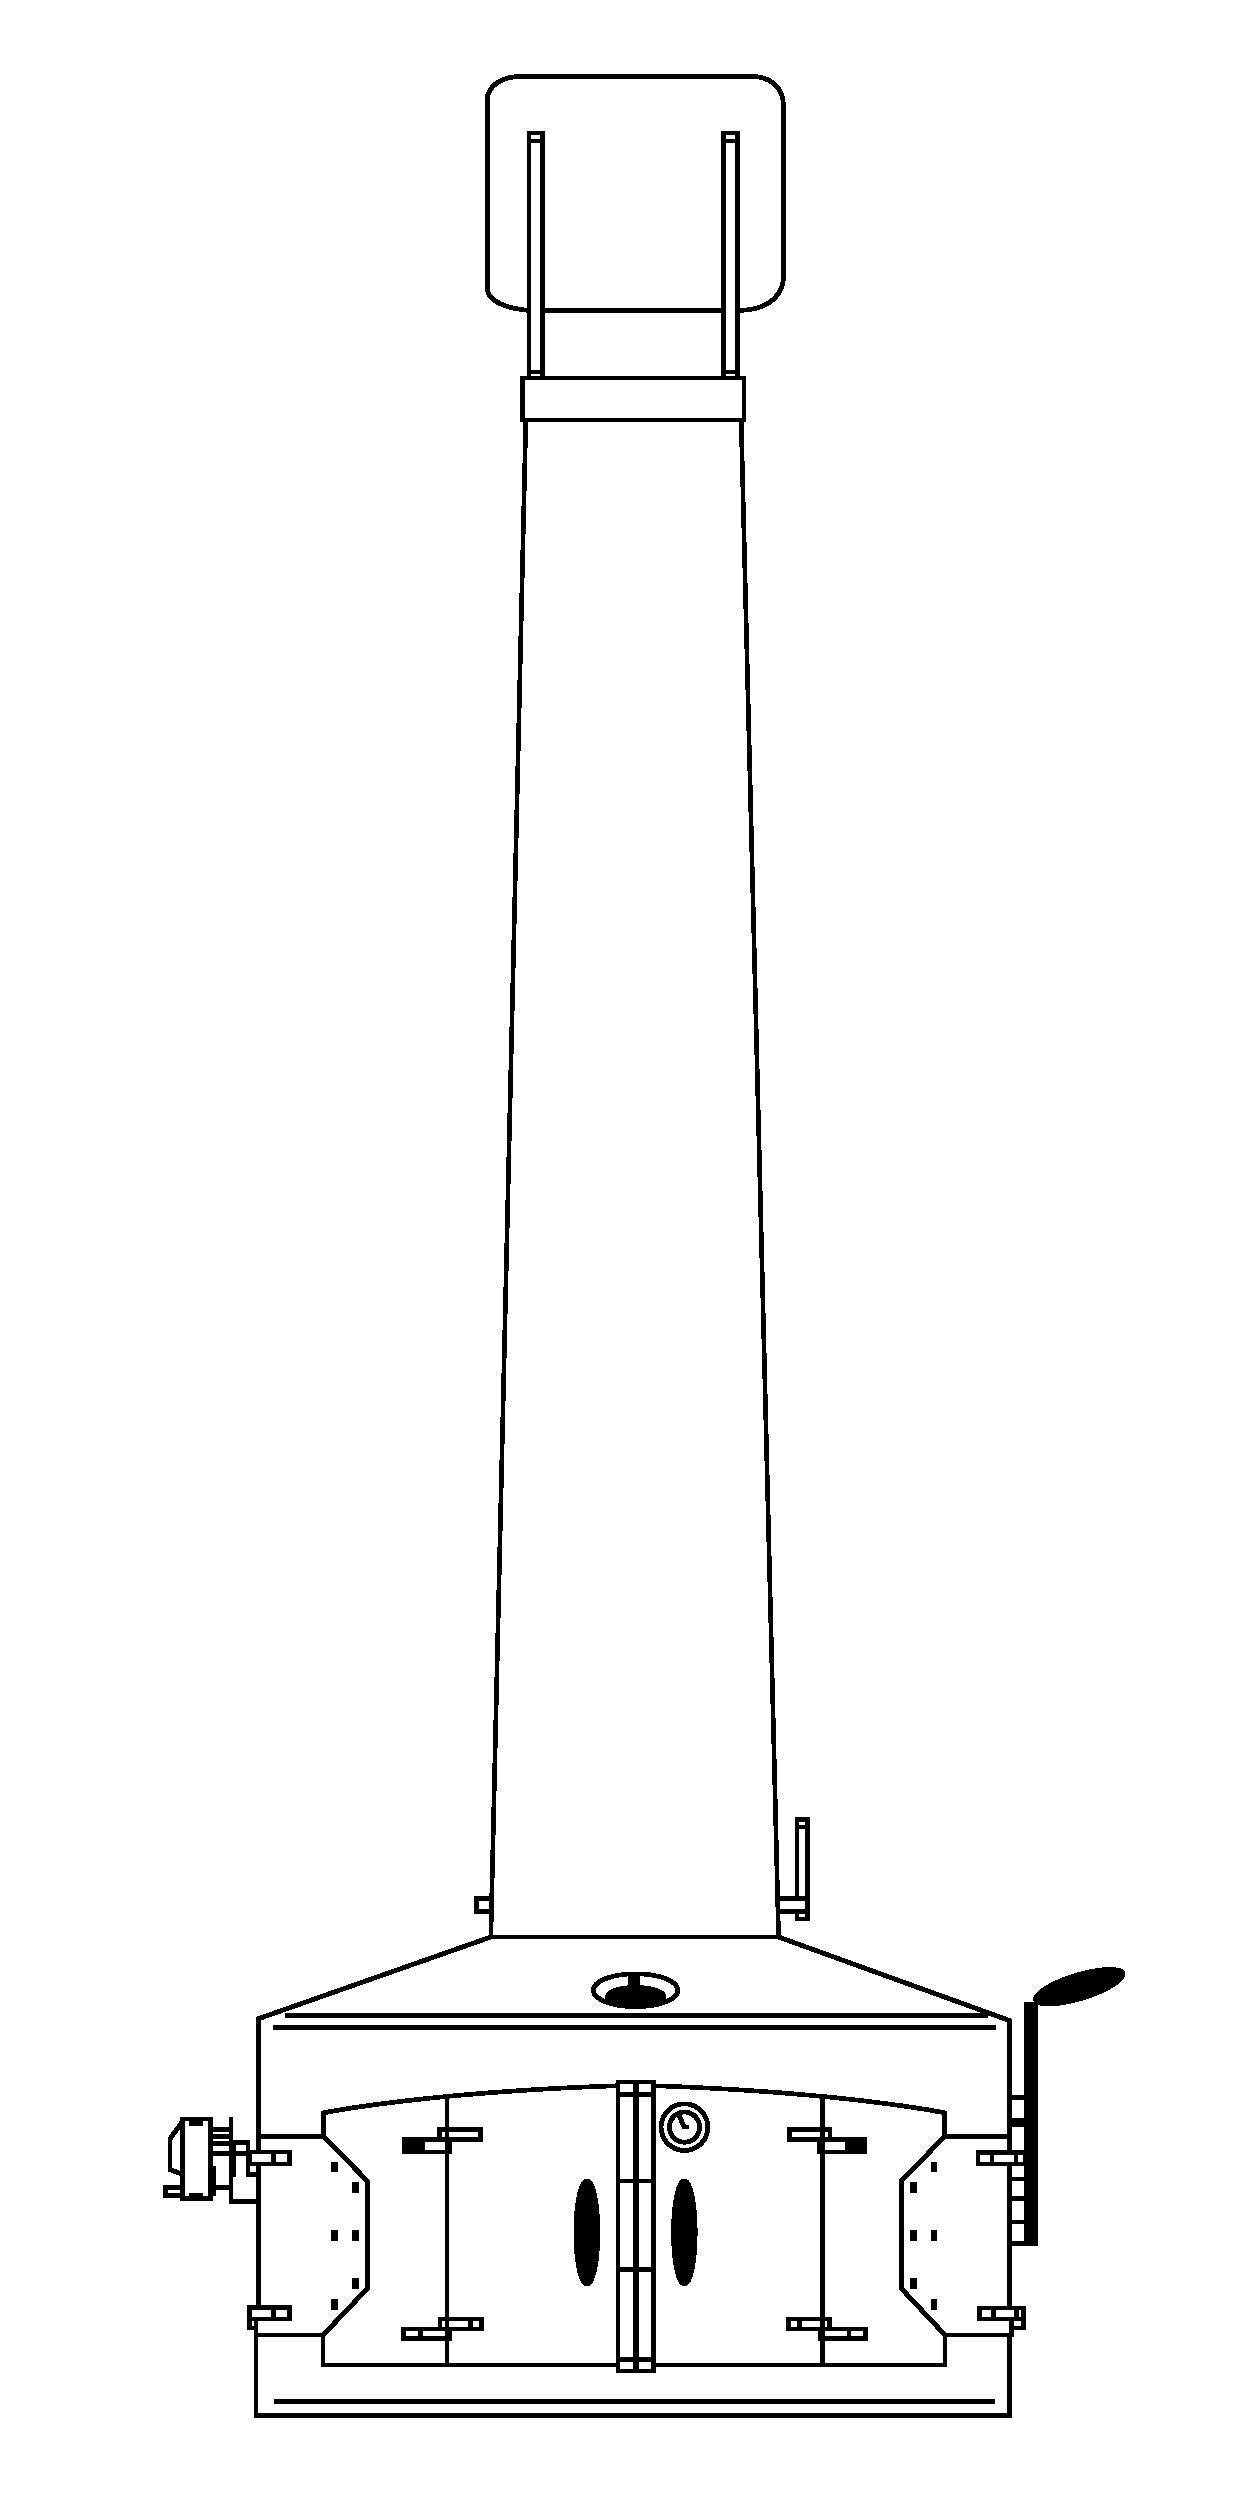 EngelFires_linediagram-01.png